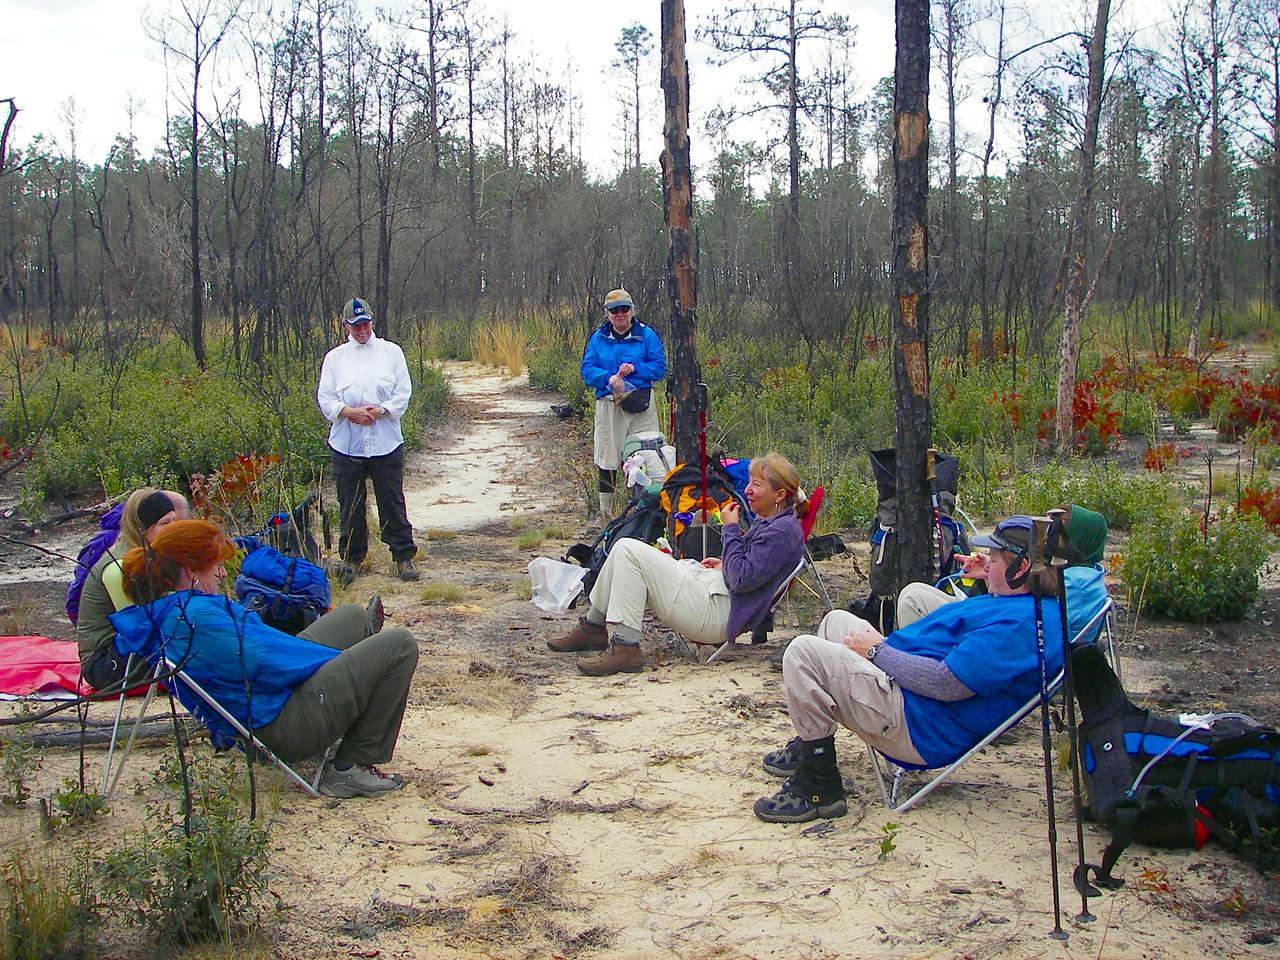 Backpackers take a rest break<br /> photo credit: Deb Blick / Florida Trail Association